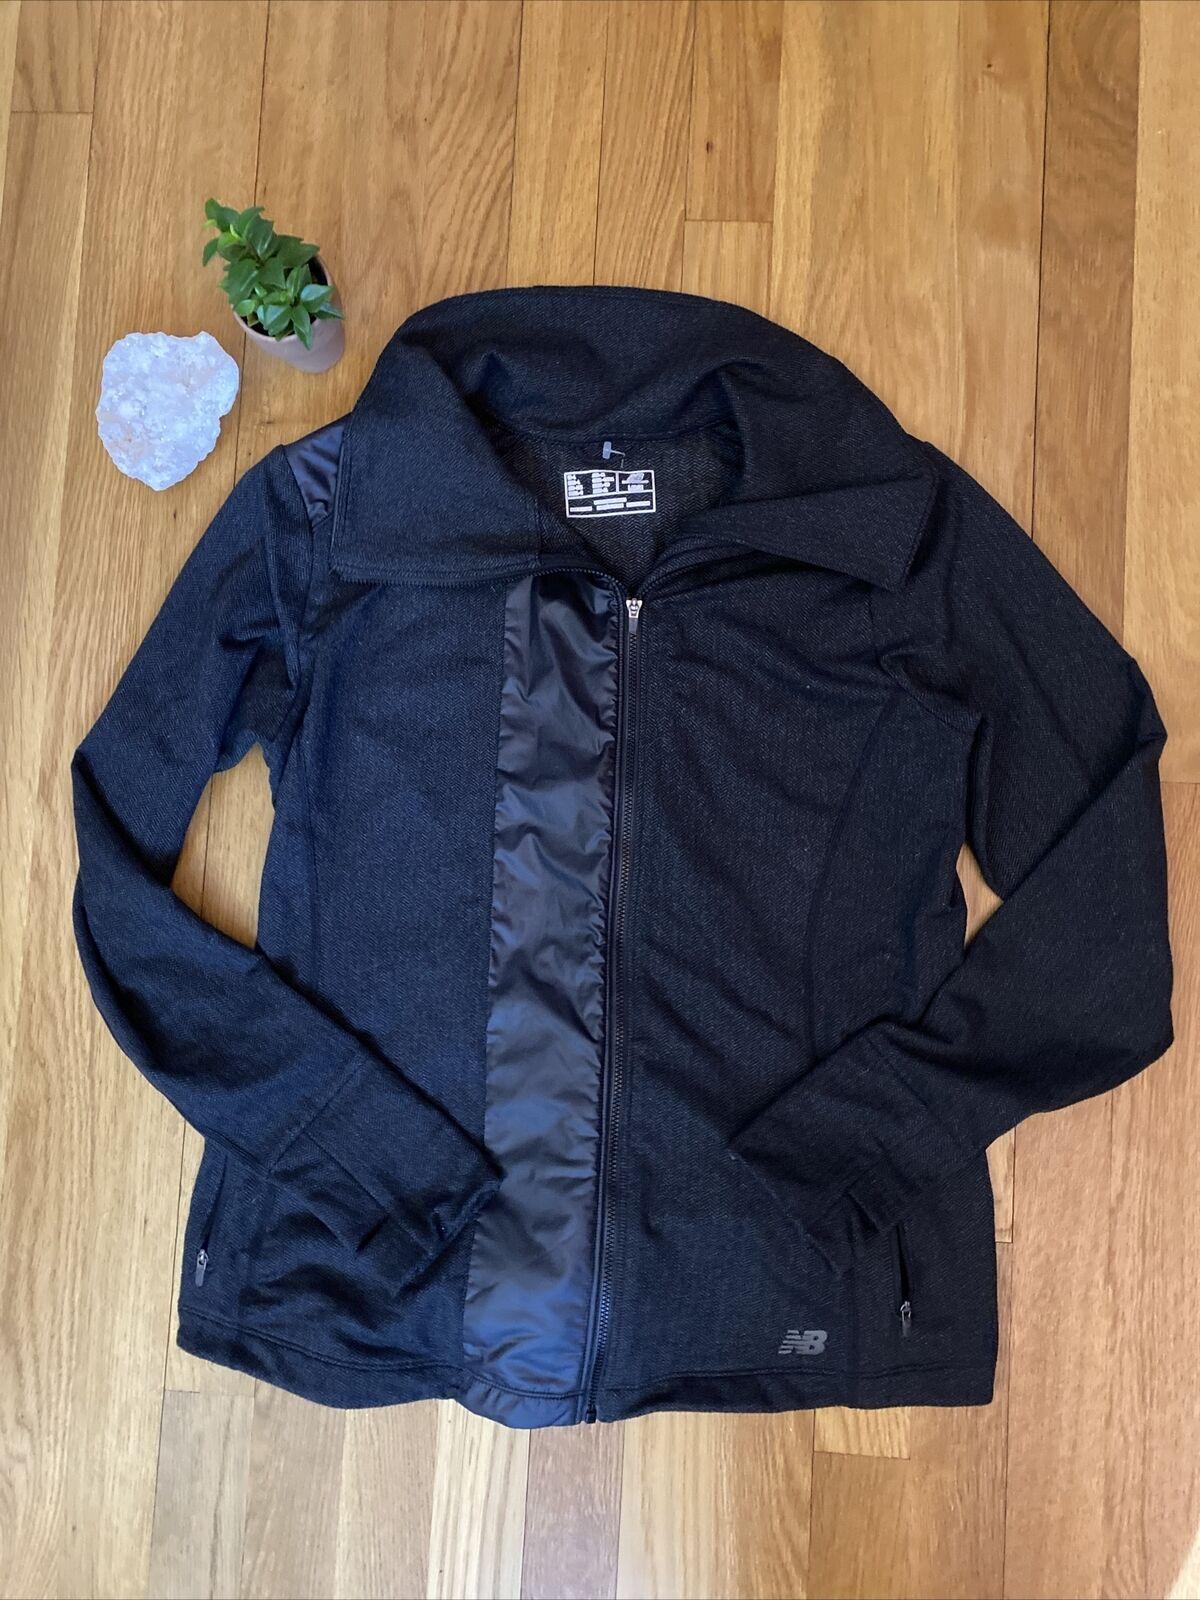 New Balance Womens Large Gray Light Chevron Active Jacket Polyester Nylon